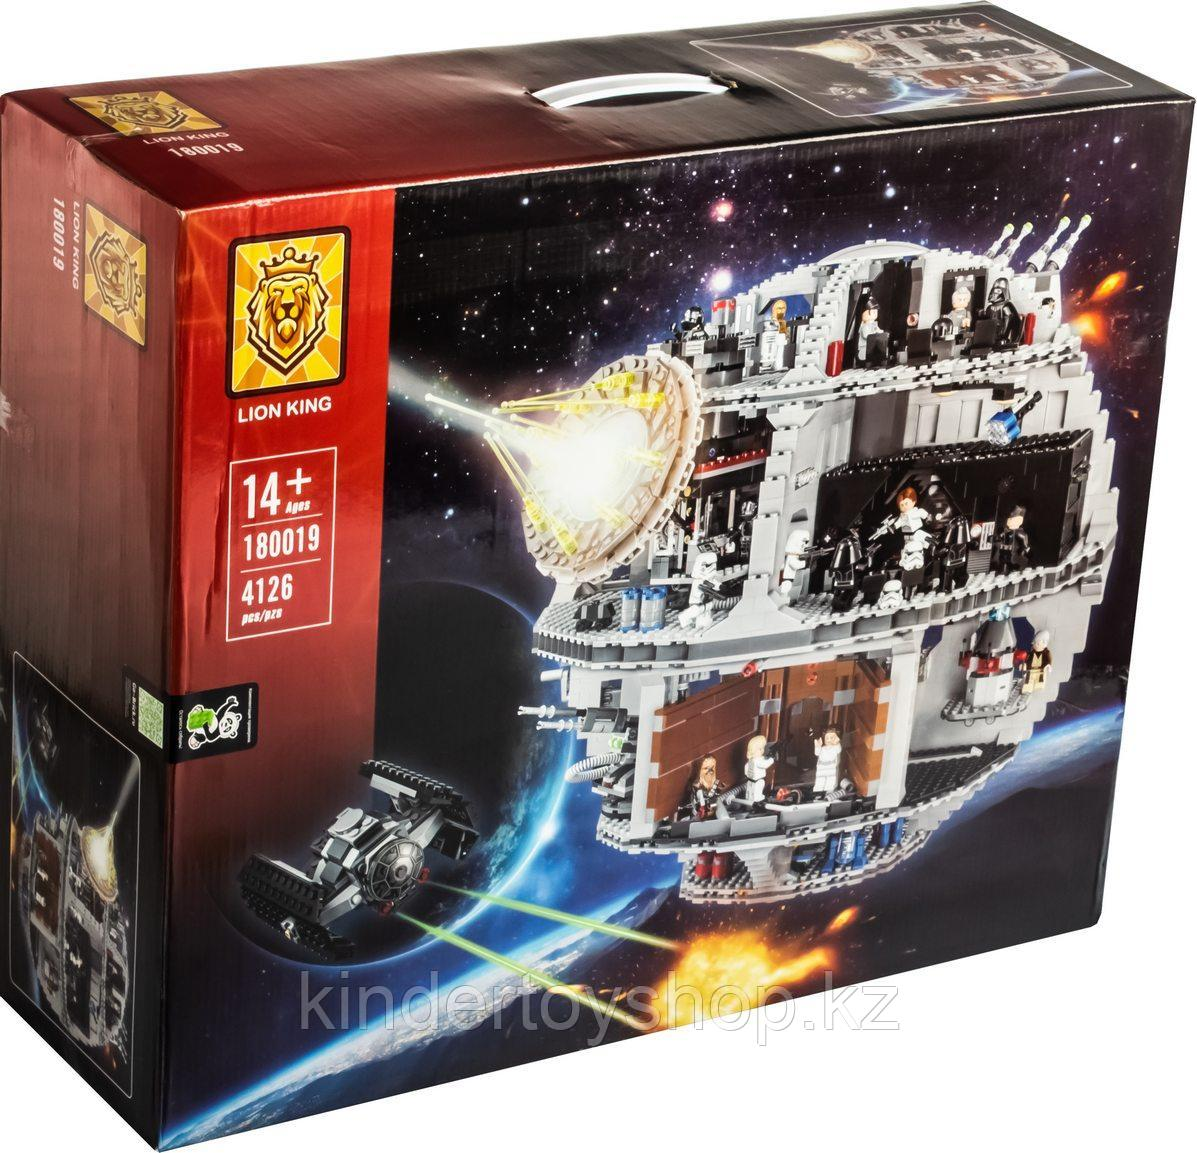 "Конструктор аналог лего LEGO 10188 Lepin LionKing 180009 Star Wars ""Орбитальная боевая станция Звезда Смерти"